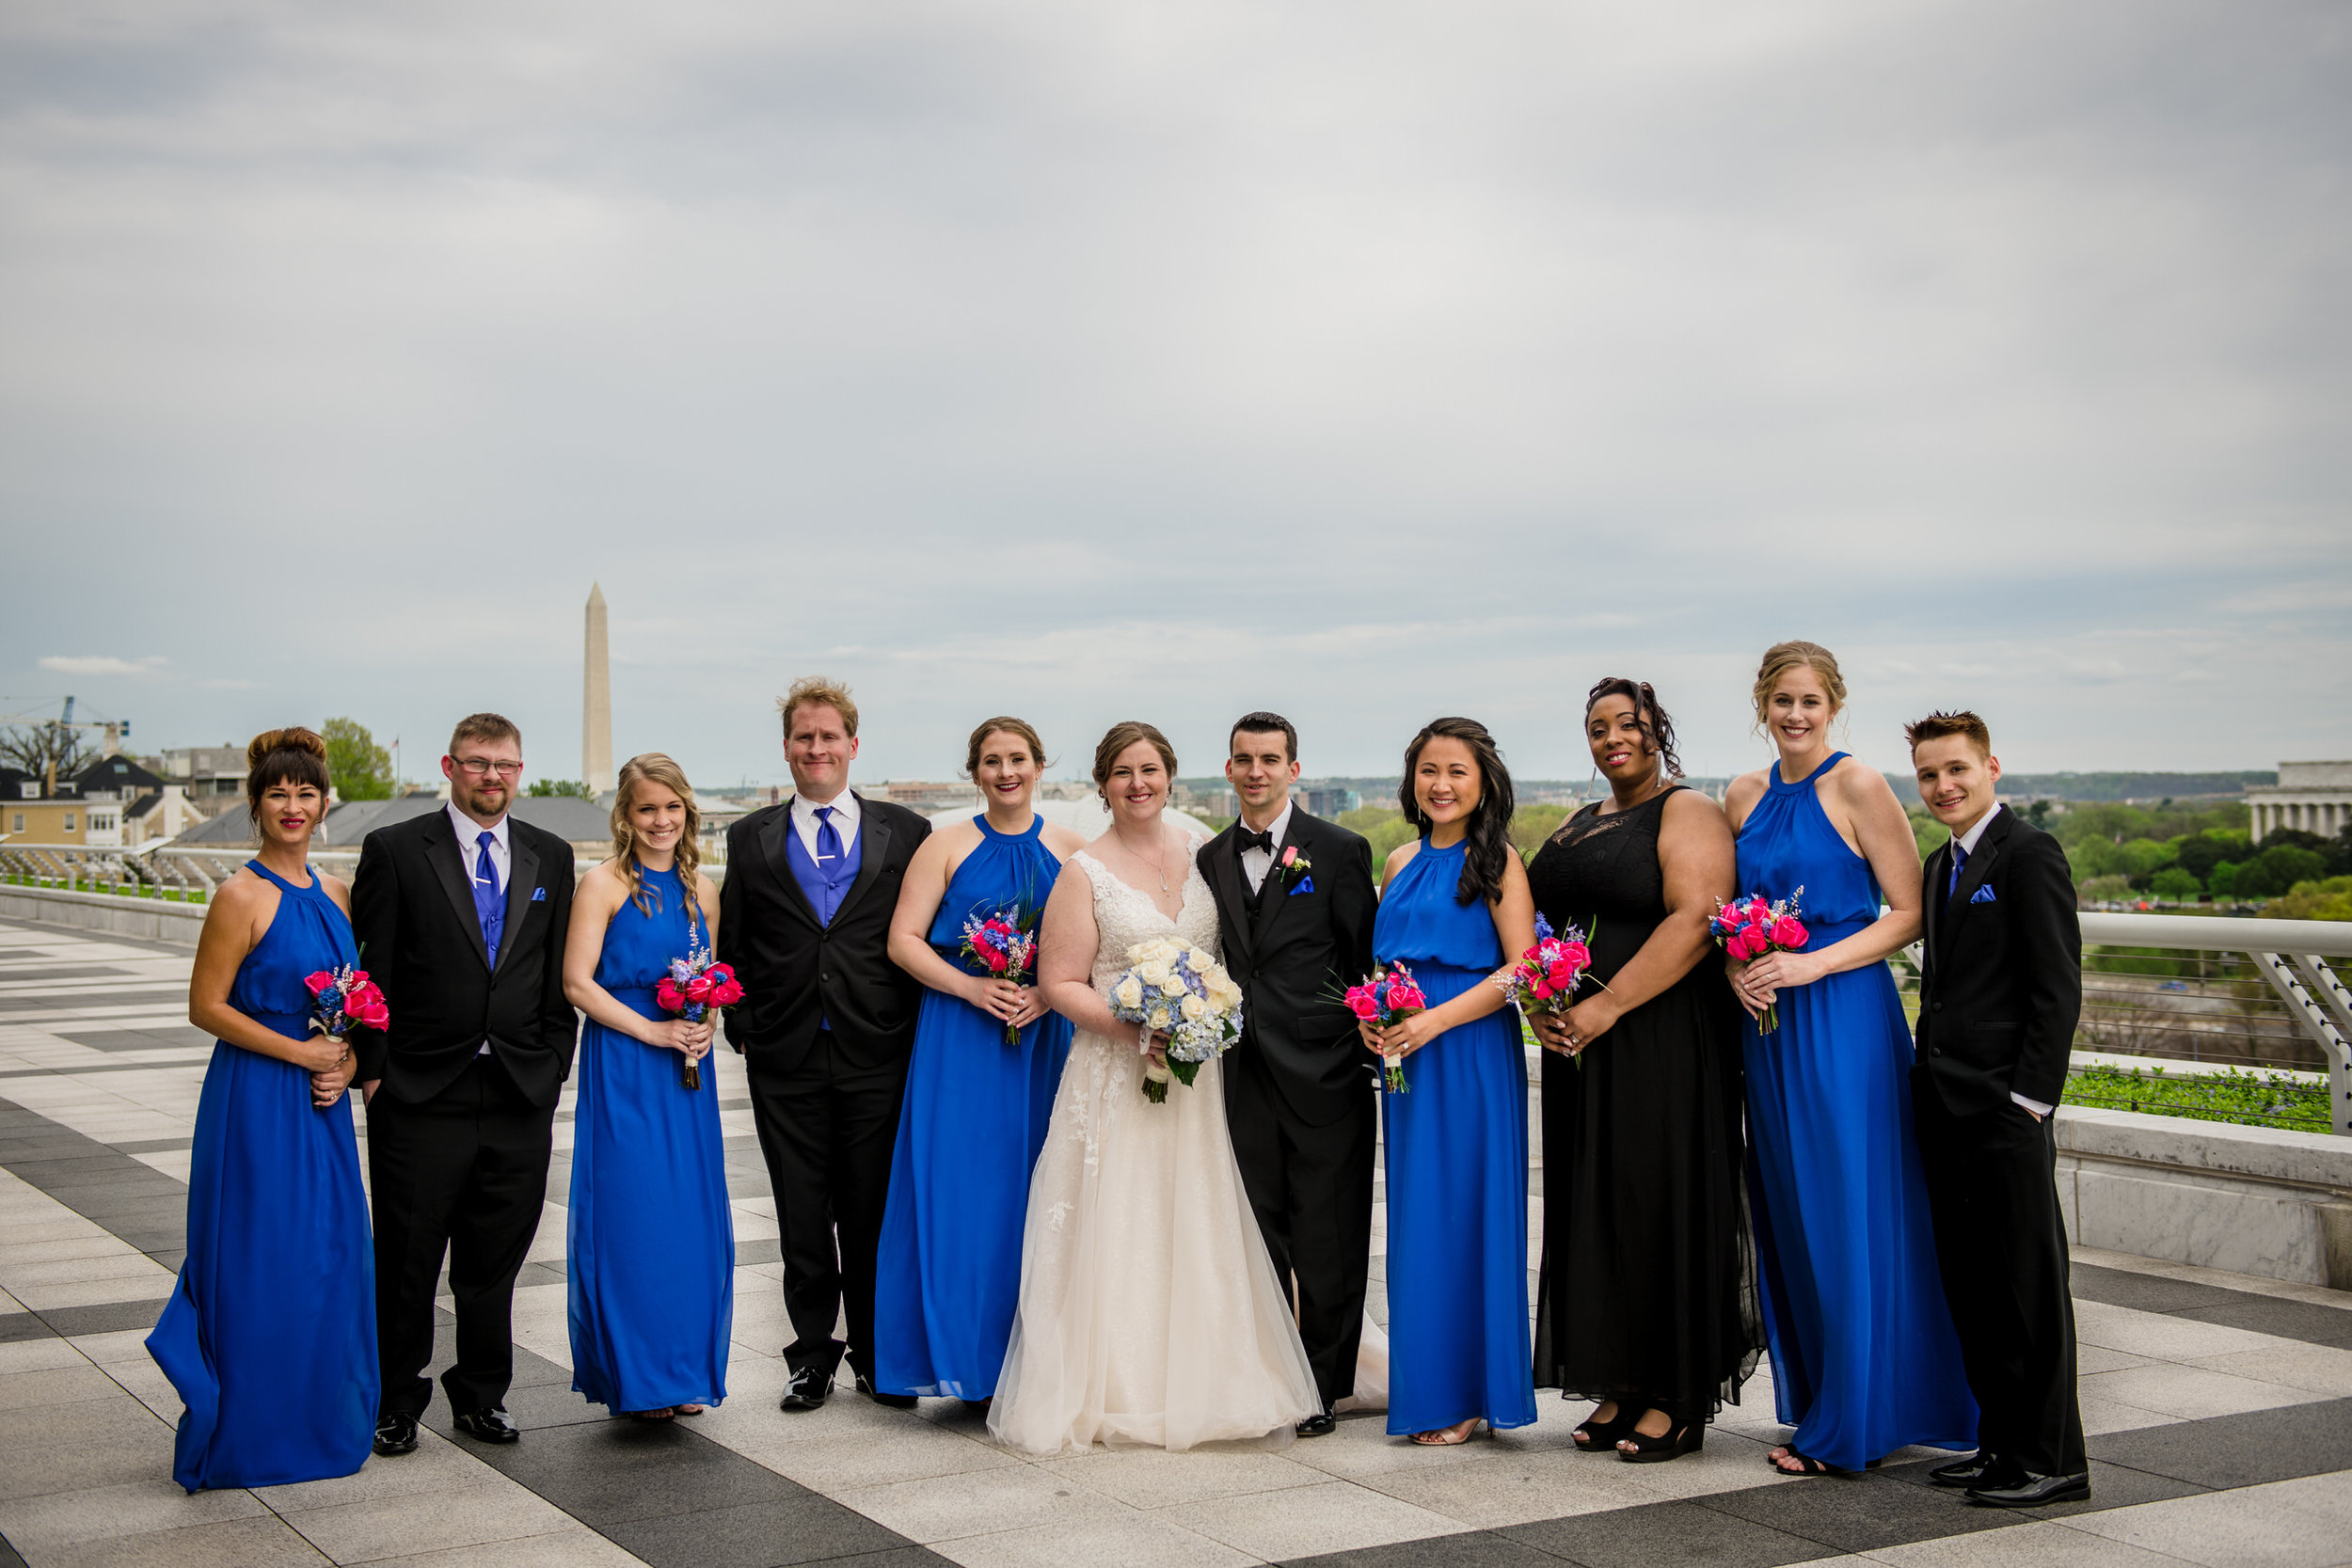 MarriottDC-Sarah&Sasha-WeddingParty-9870.jpg